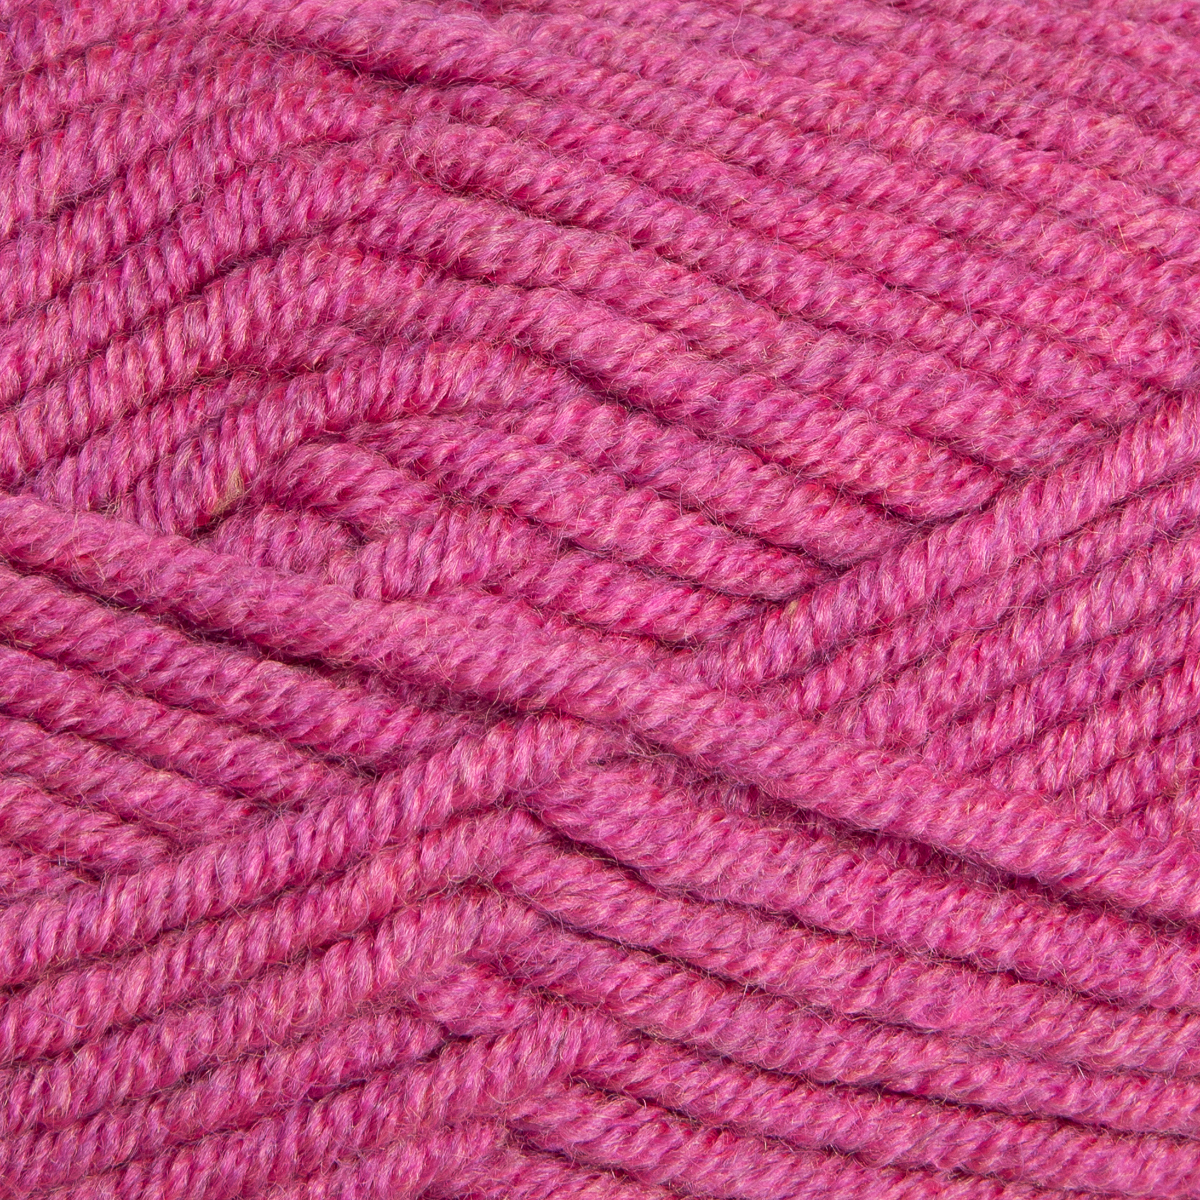 3pk-Lion-Brand-Woolspun-Acrylic-amp-Wool-Yarn-Bulky-5-Knit-Crocheting-Skeins-Soft thumbnail 51